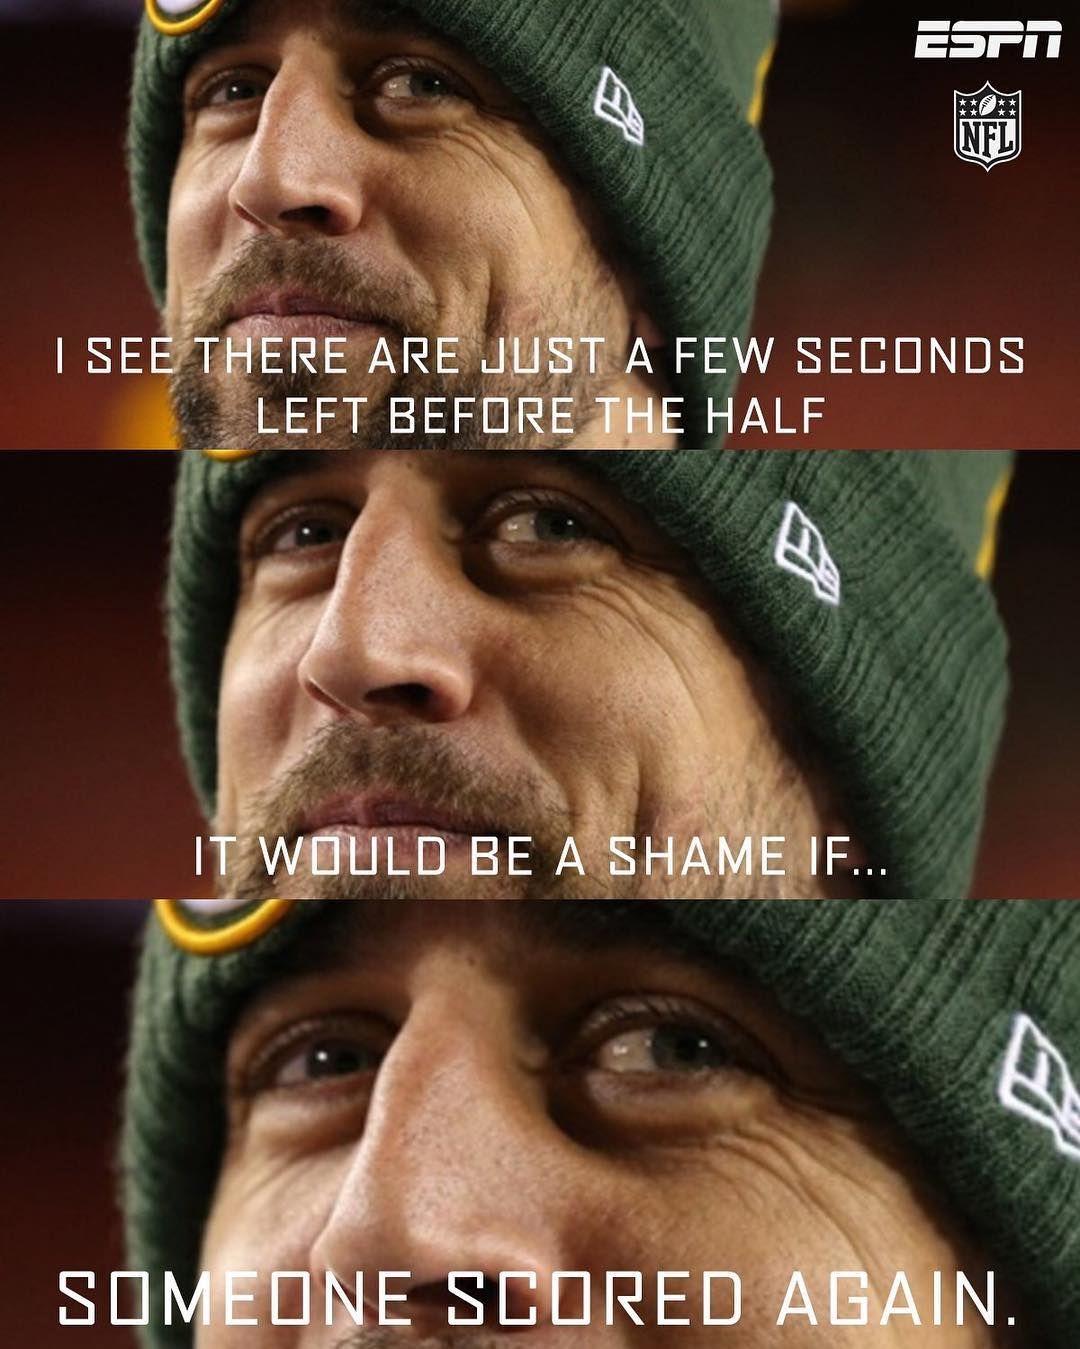 Packers Memes 2017 : packers, memes, EXACTLY, Happened, 10-15-2018., Yassssssss!!!!, Green, Packers, Meme,, Memes,